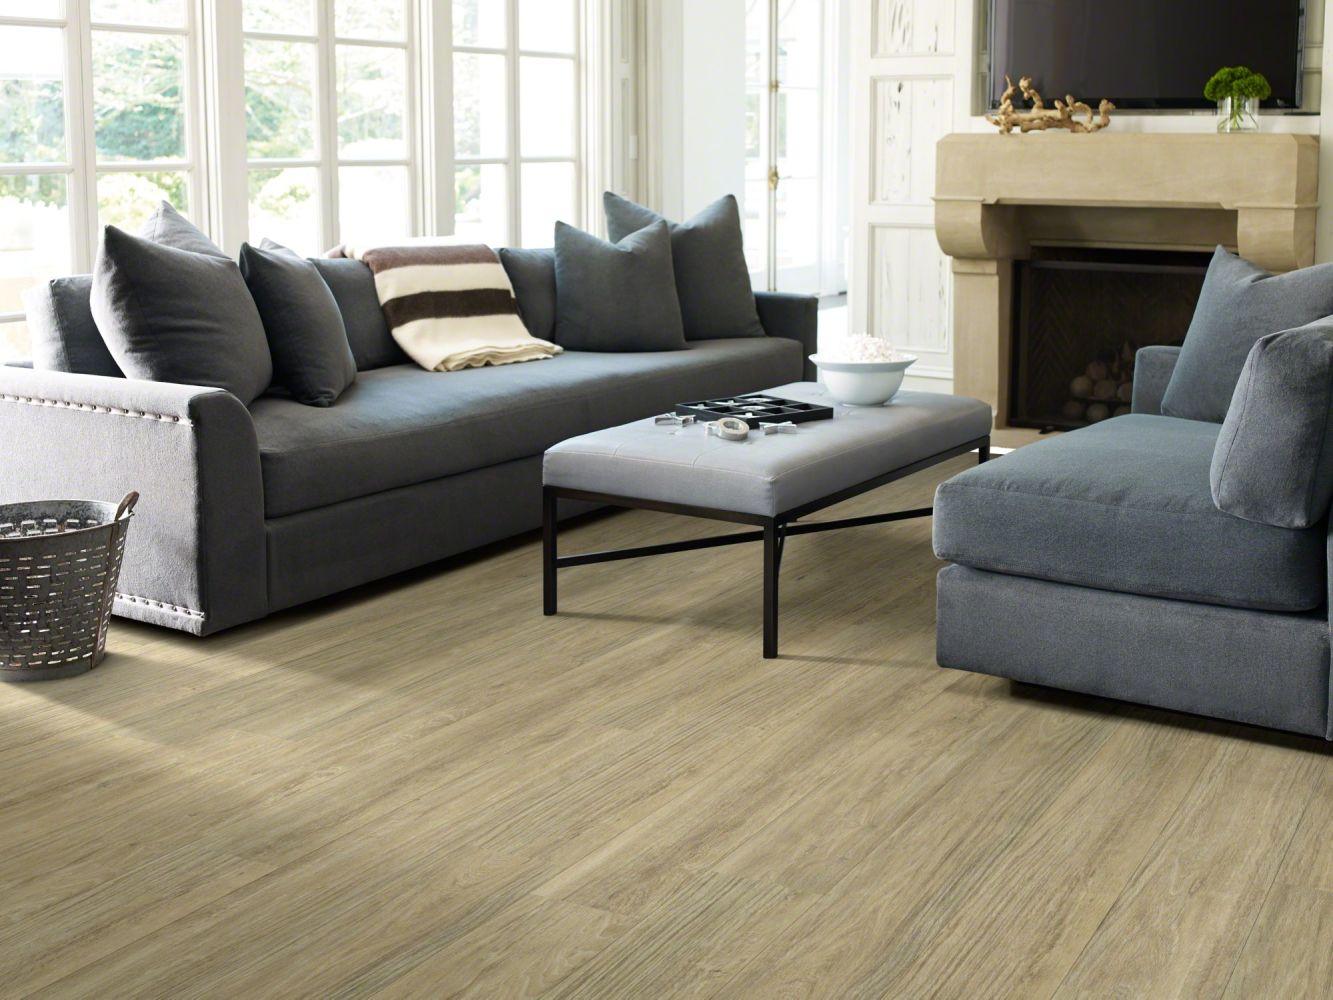 Shaw Floors Dr Horton Arabesque Pla + Carbonaro 00124_DR013